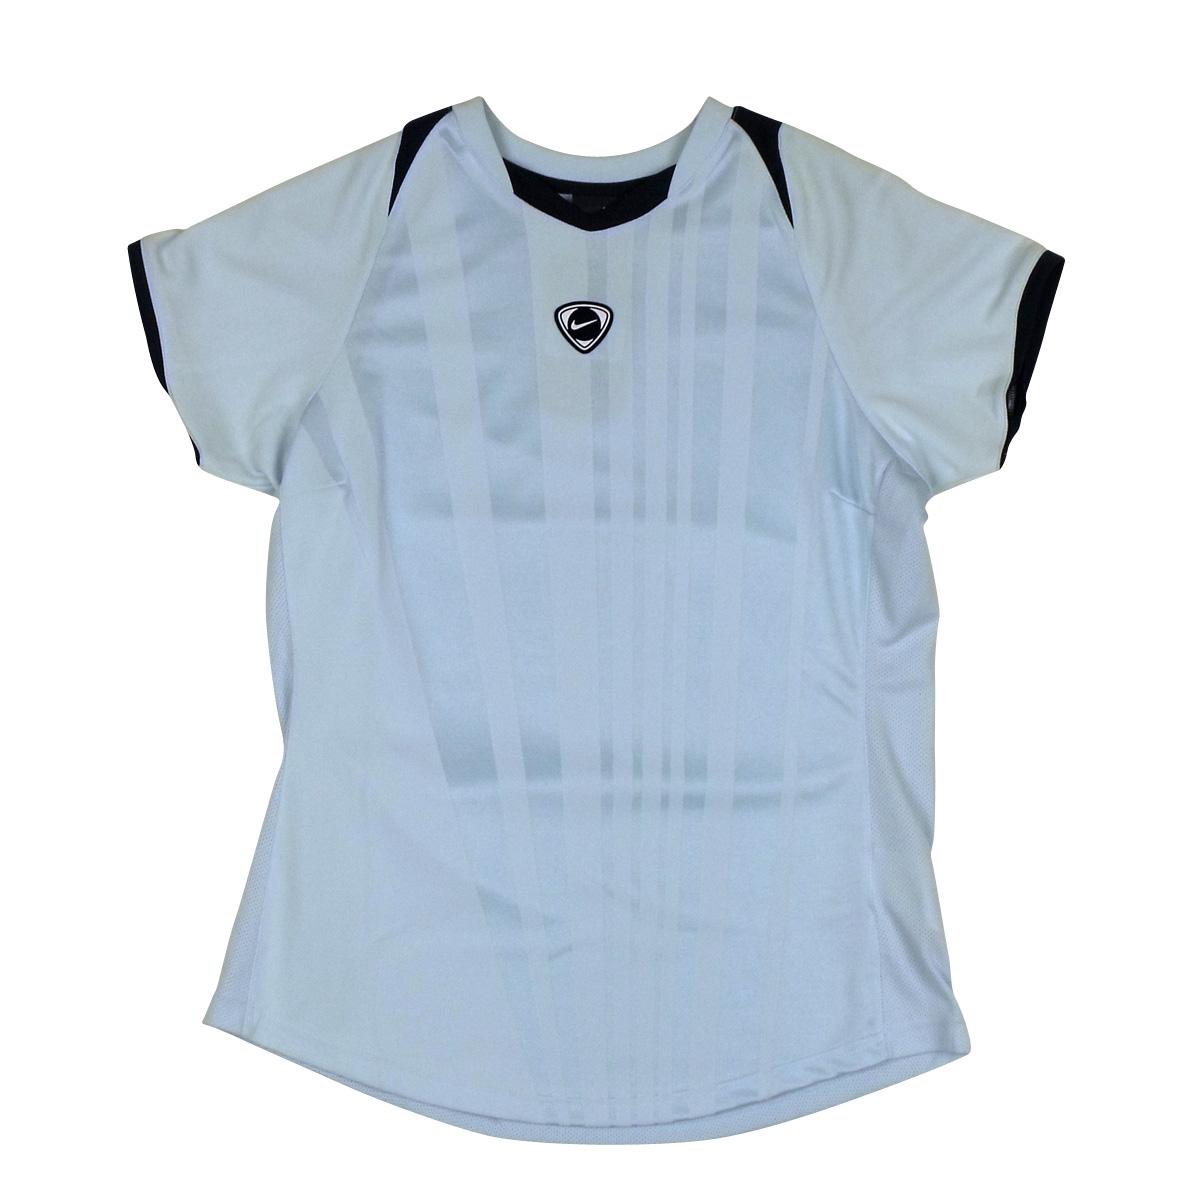 Womens Nike Dry Dri Fit Running Shirt Vest Top Tee Ladies